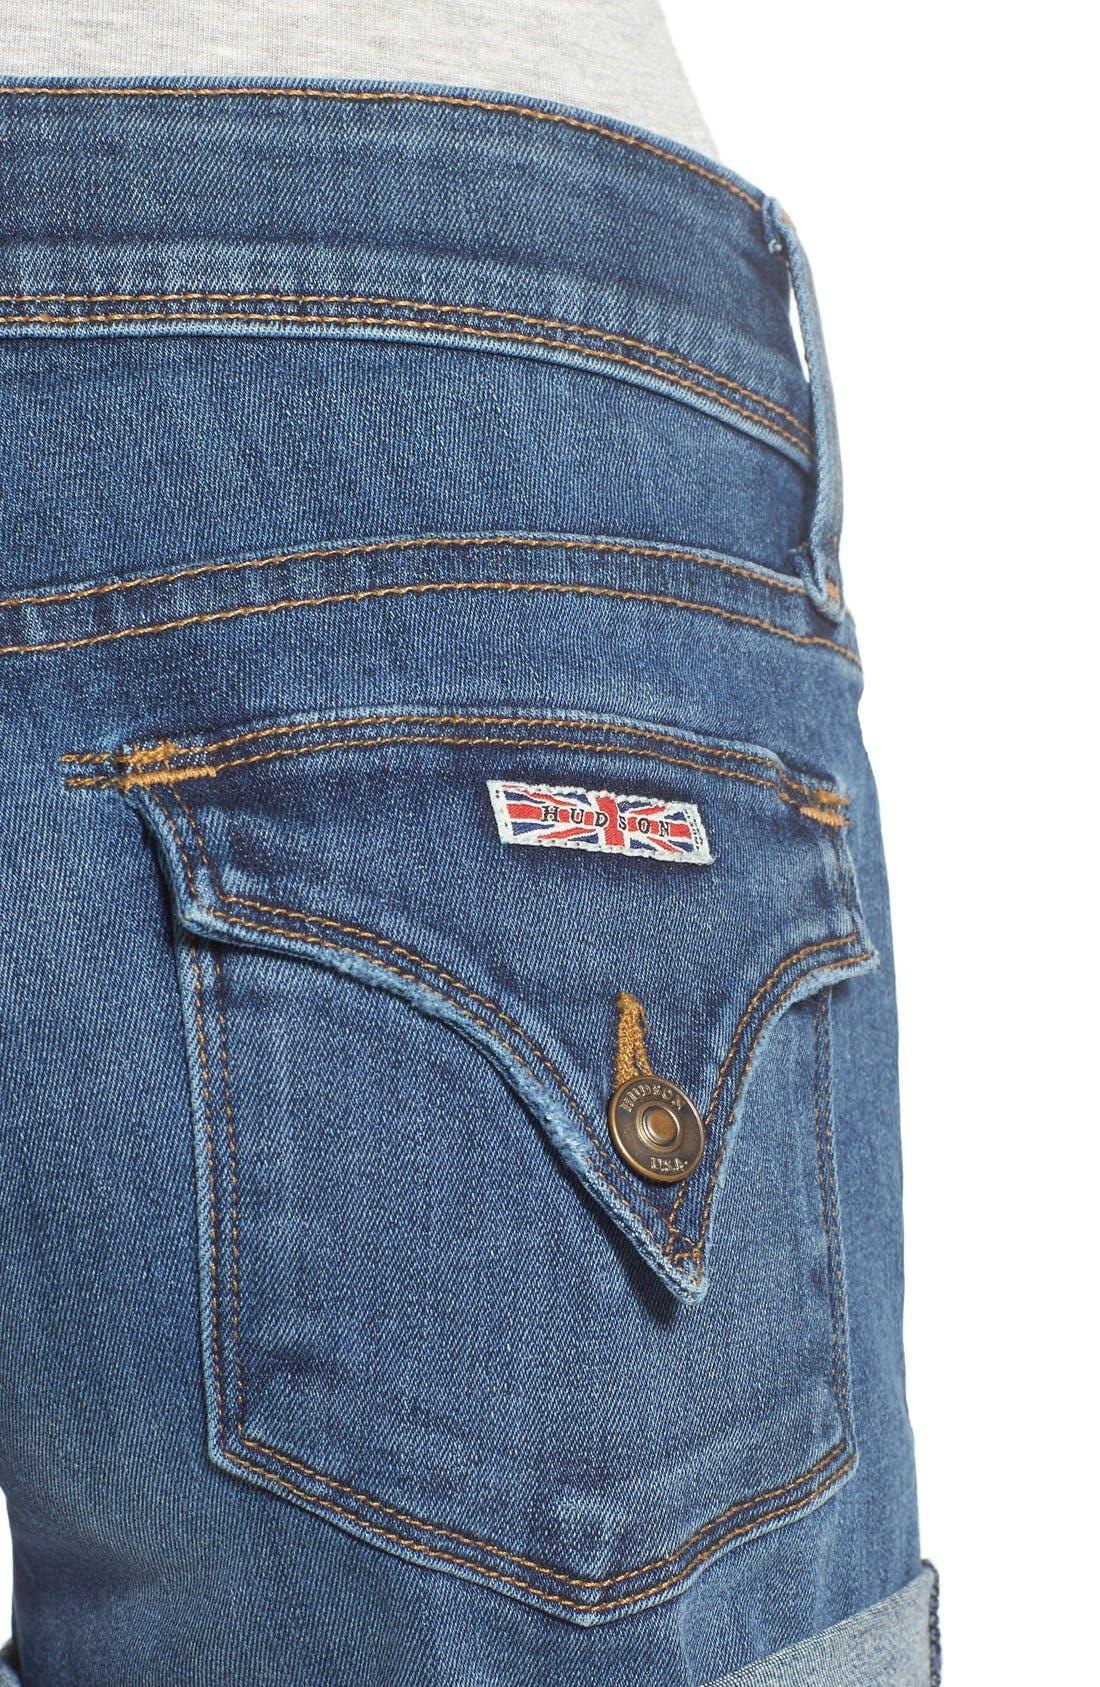 Alternate Image 4  - Hudson Jeans 'Croxley' Cuffed Denim Shorts (Advantageous)